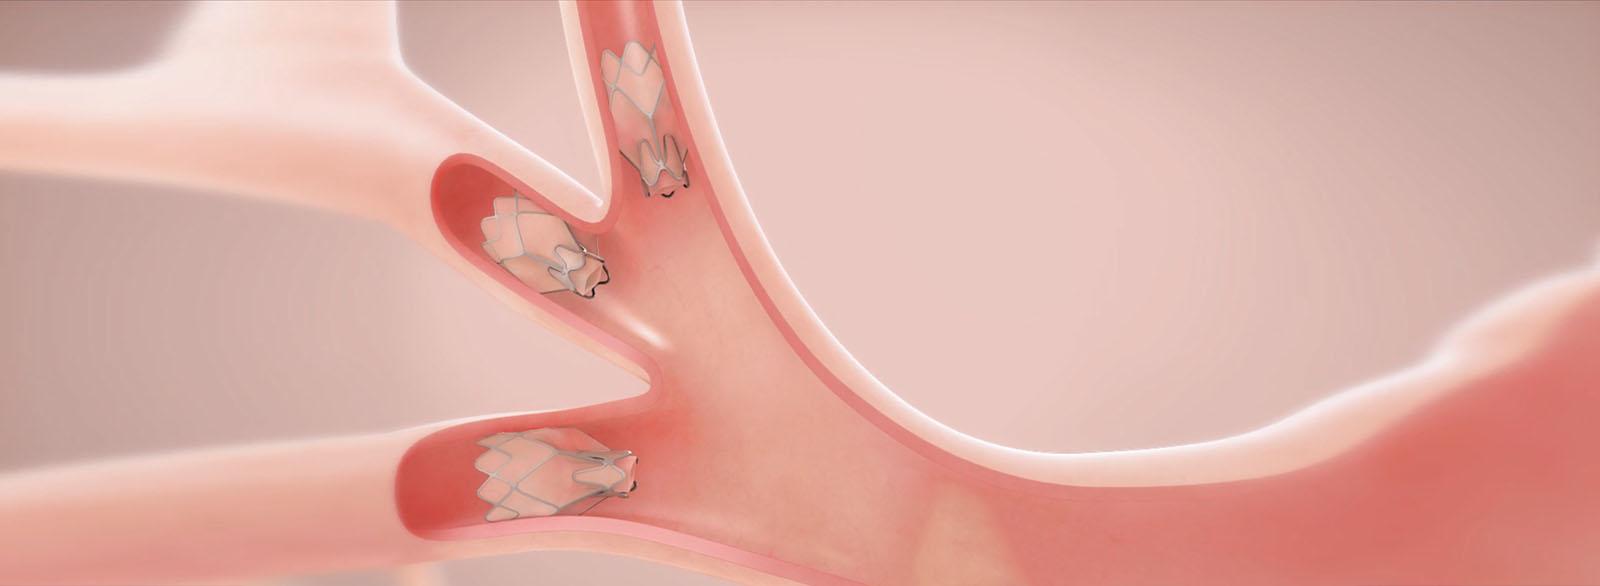 Zephyr Endobronchial Valve Treatment illustration